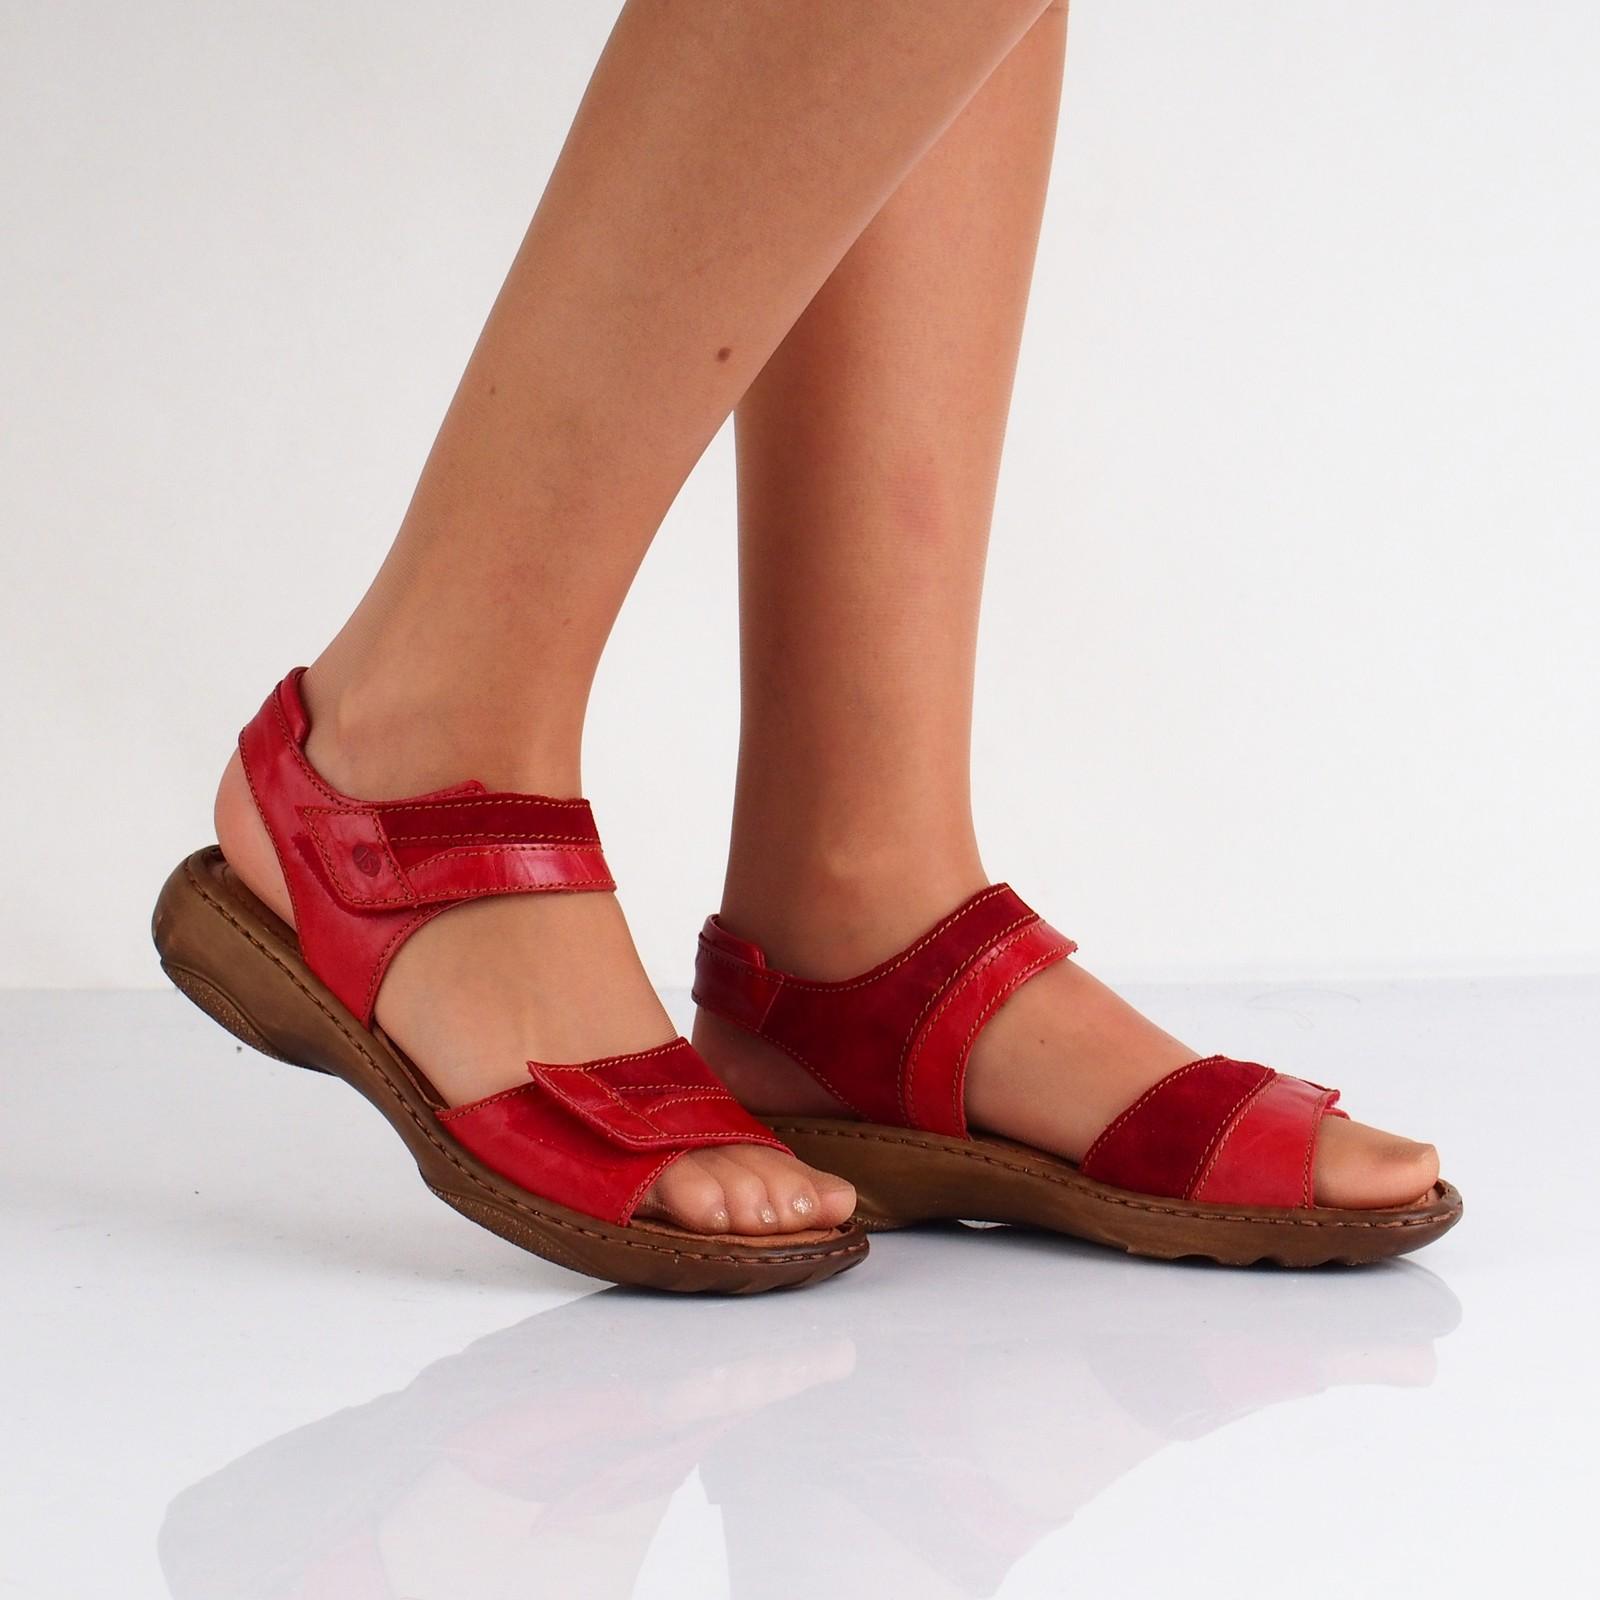 b28155693da4 Josef Seibel dámske kožené sandále - červené ...